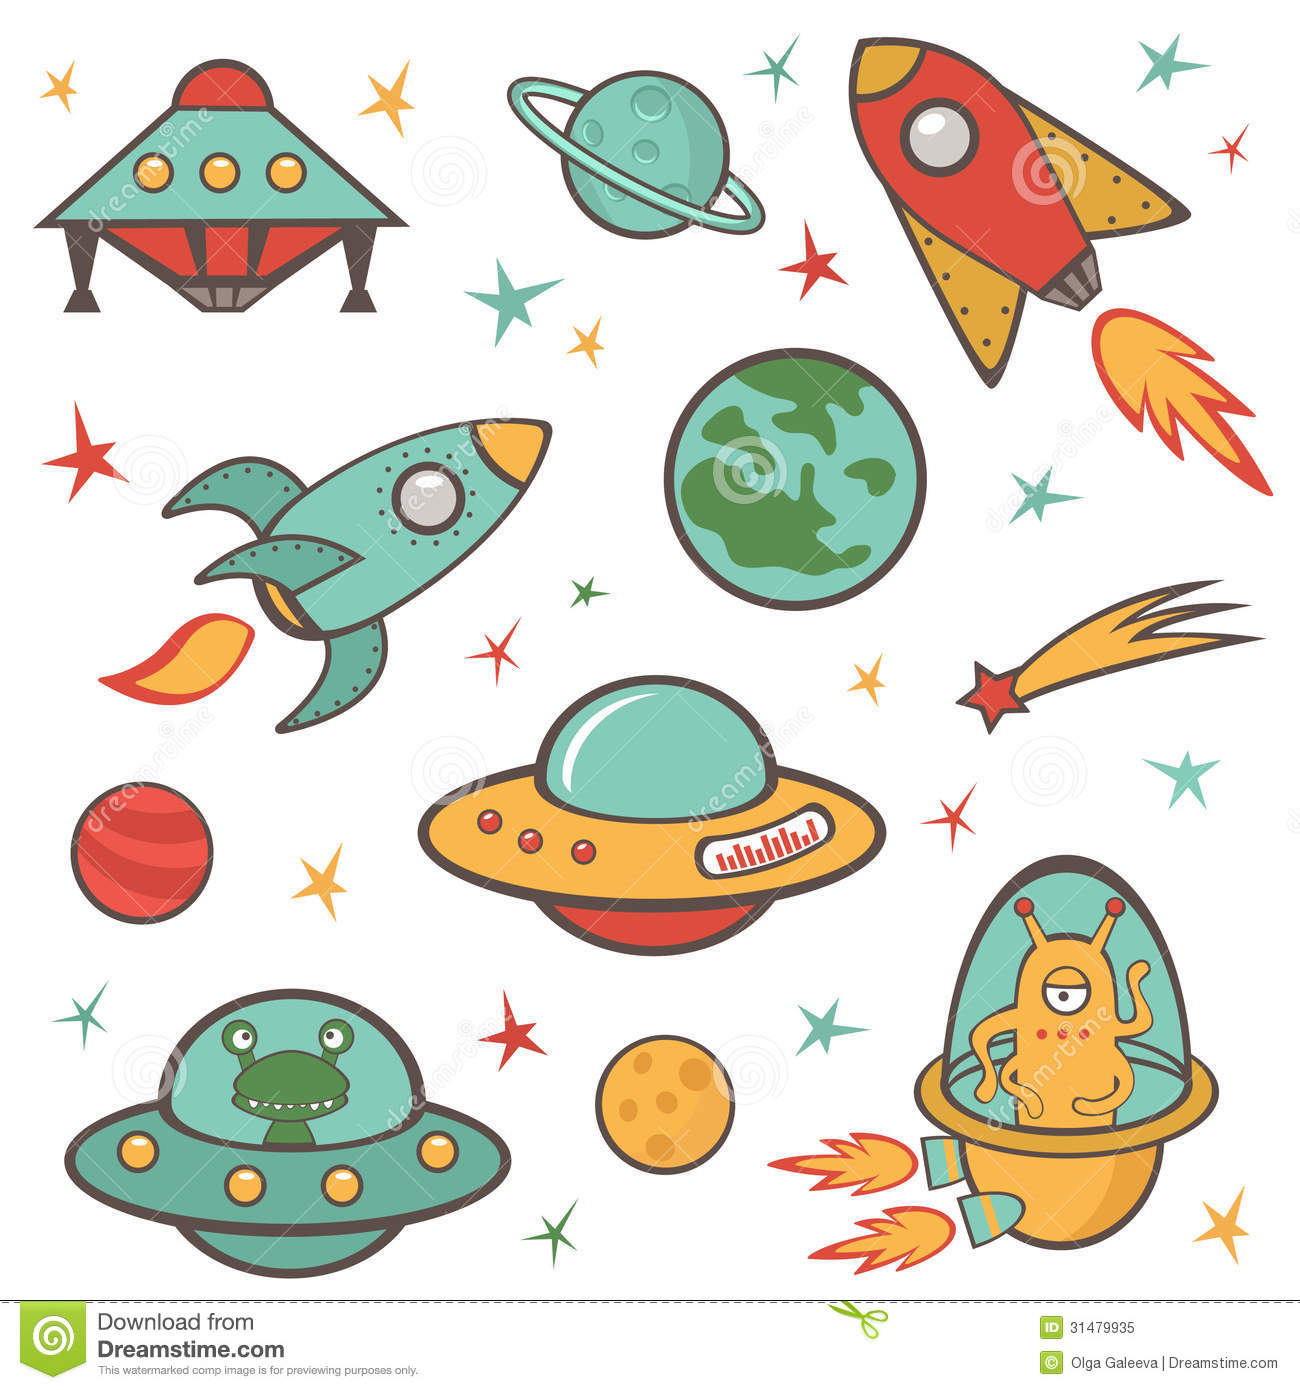 Outer space clipart - ClipartFest-Outer space clipart - ClipartFest-5